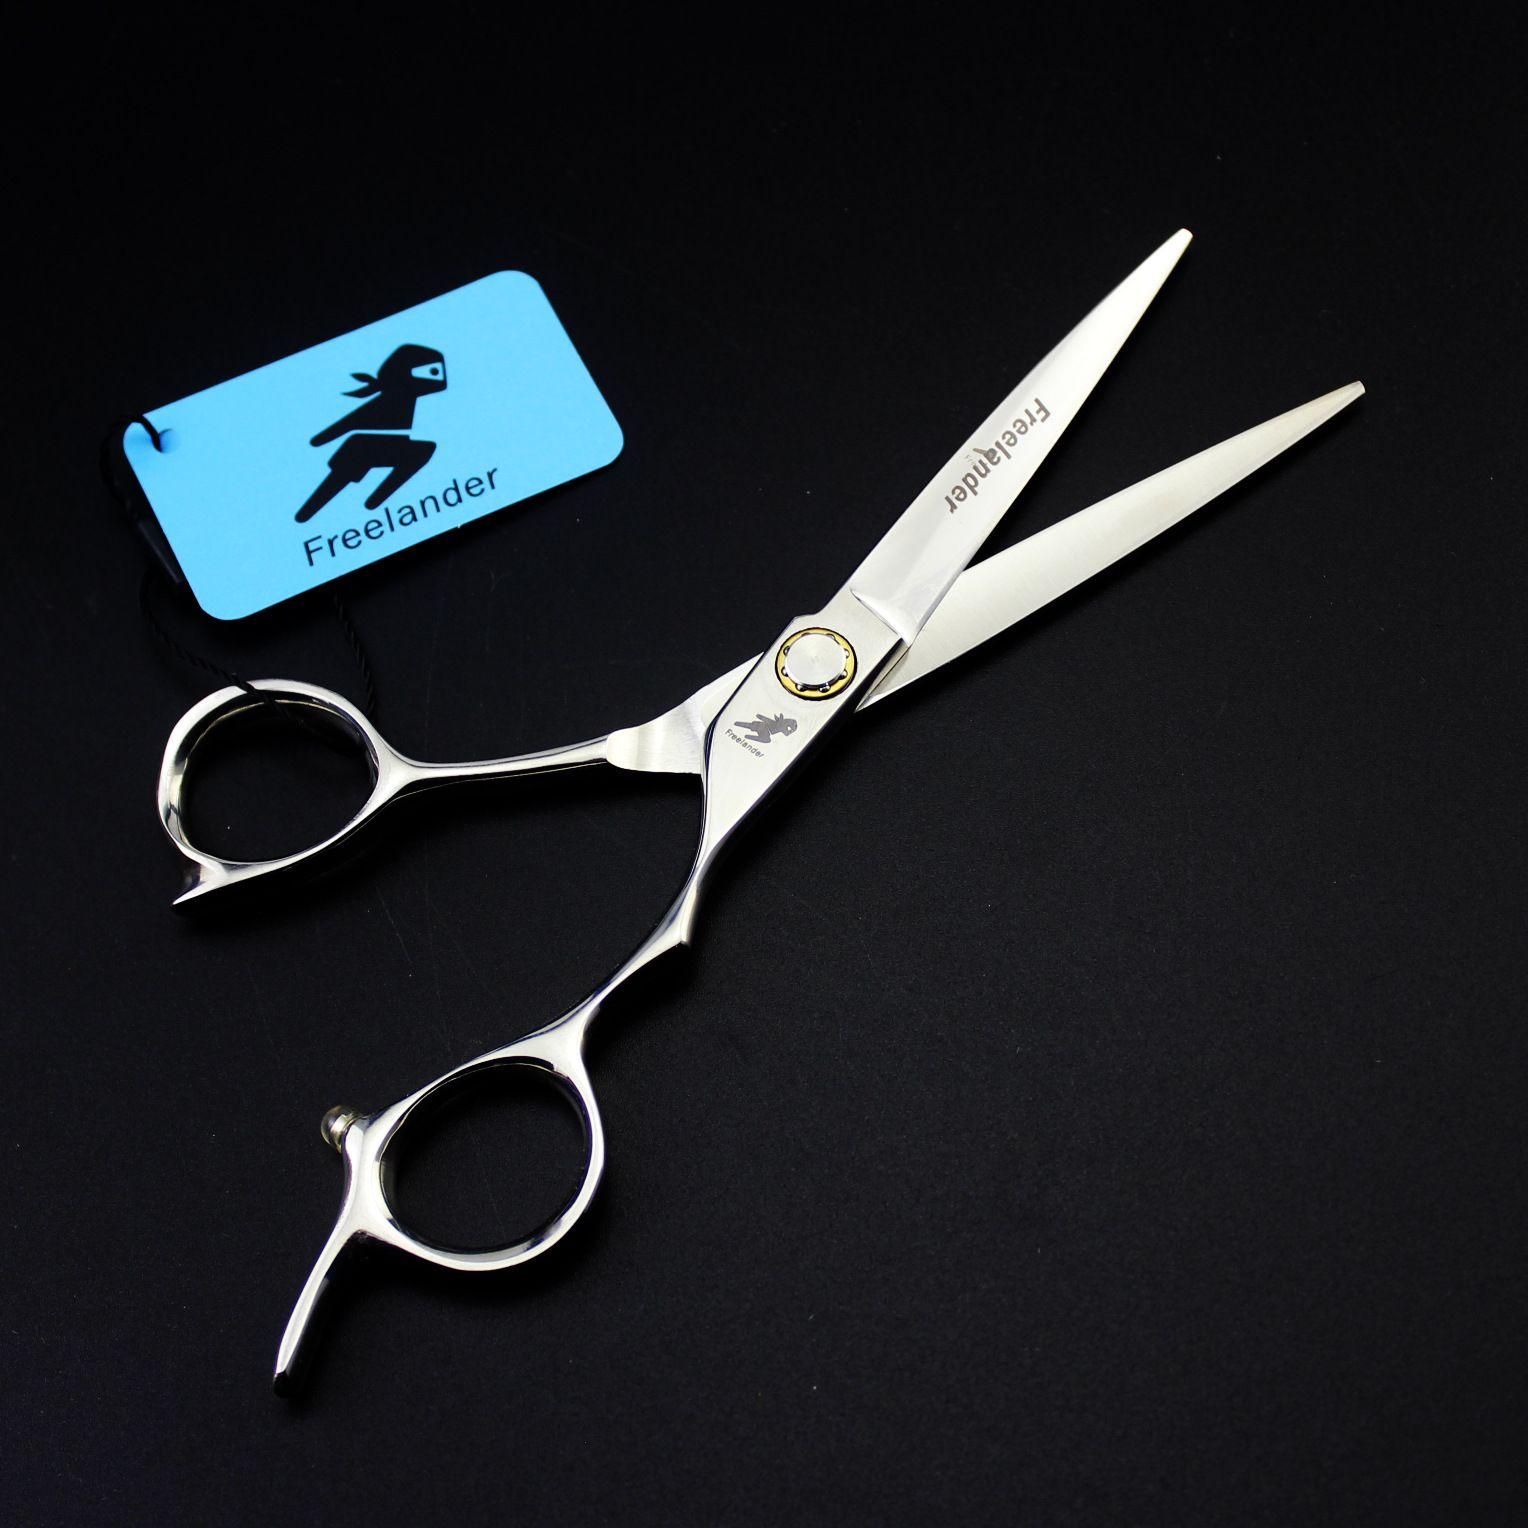 6 Inch Professional hairdresser's Cutting Scissors Japan 440C Steel Barber Shears Tool barber equipment